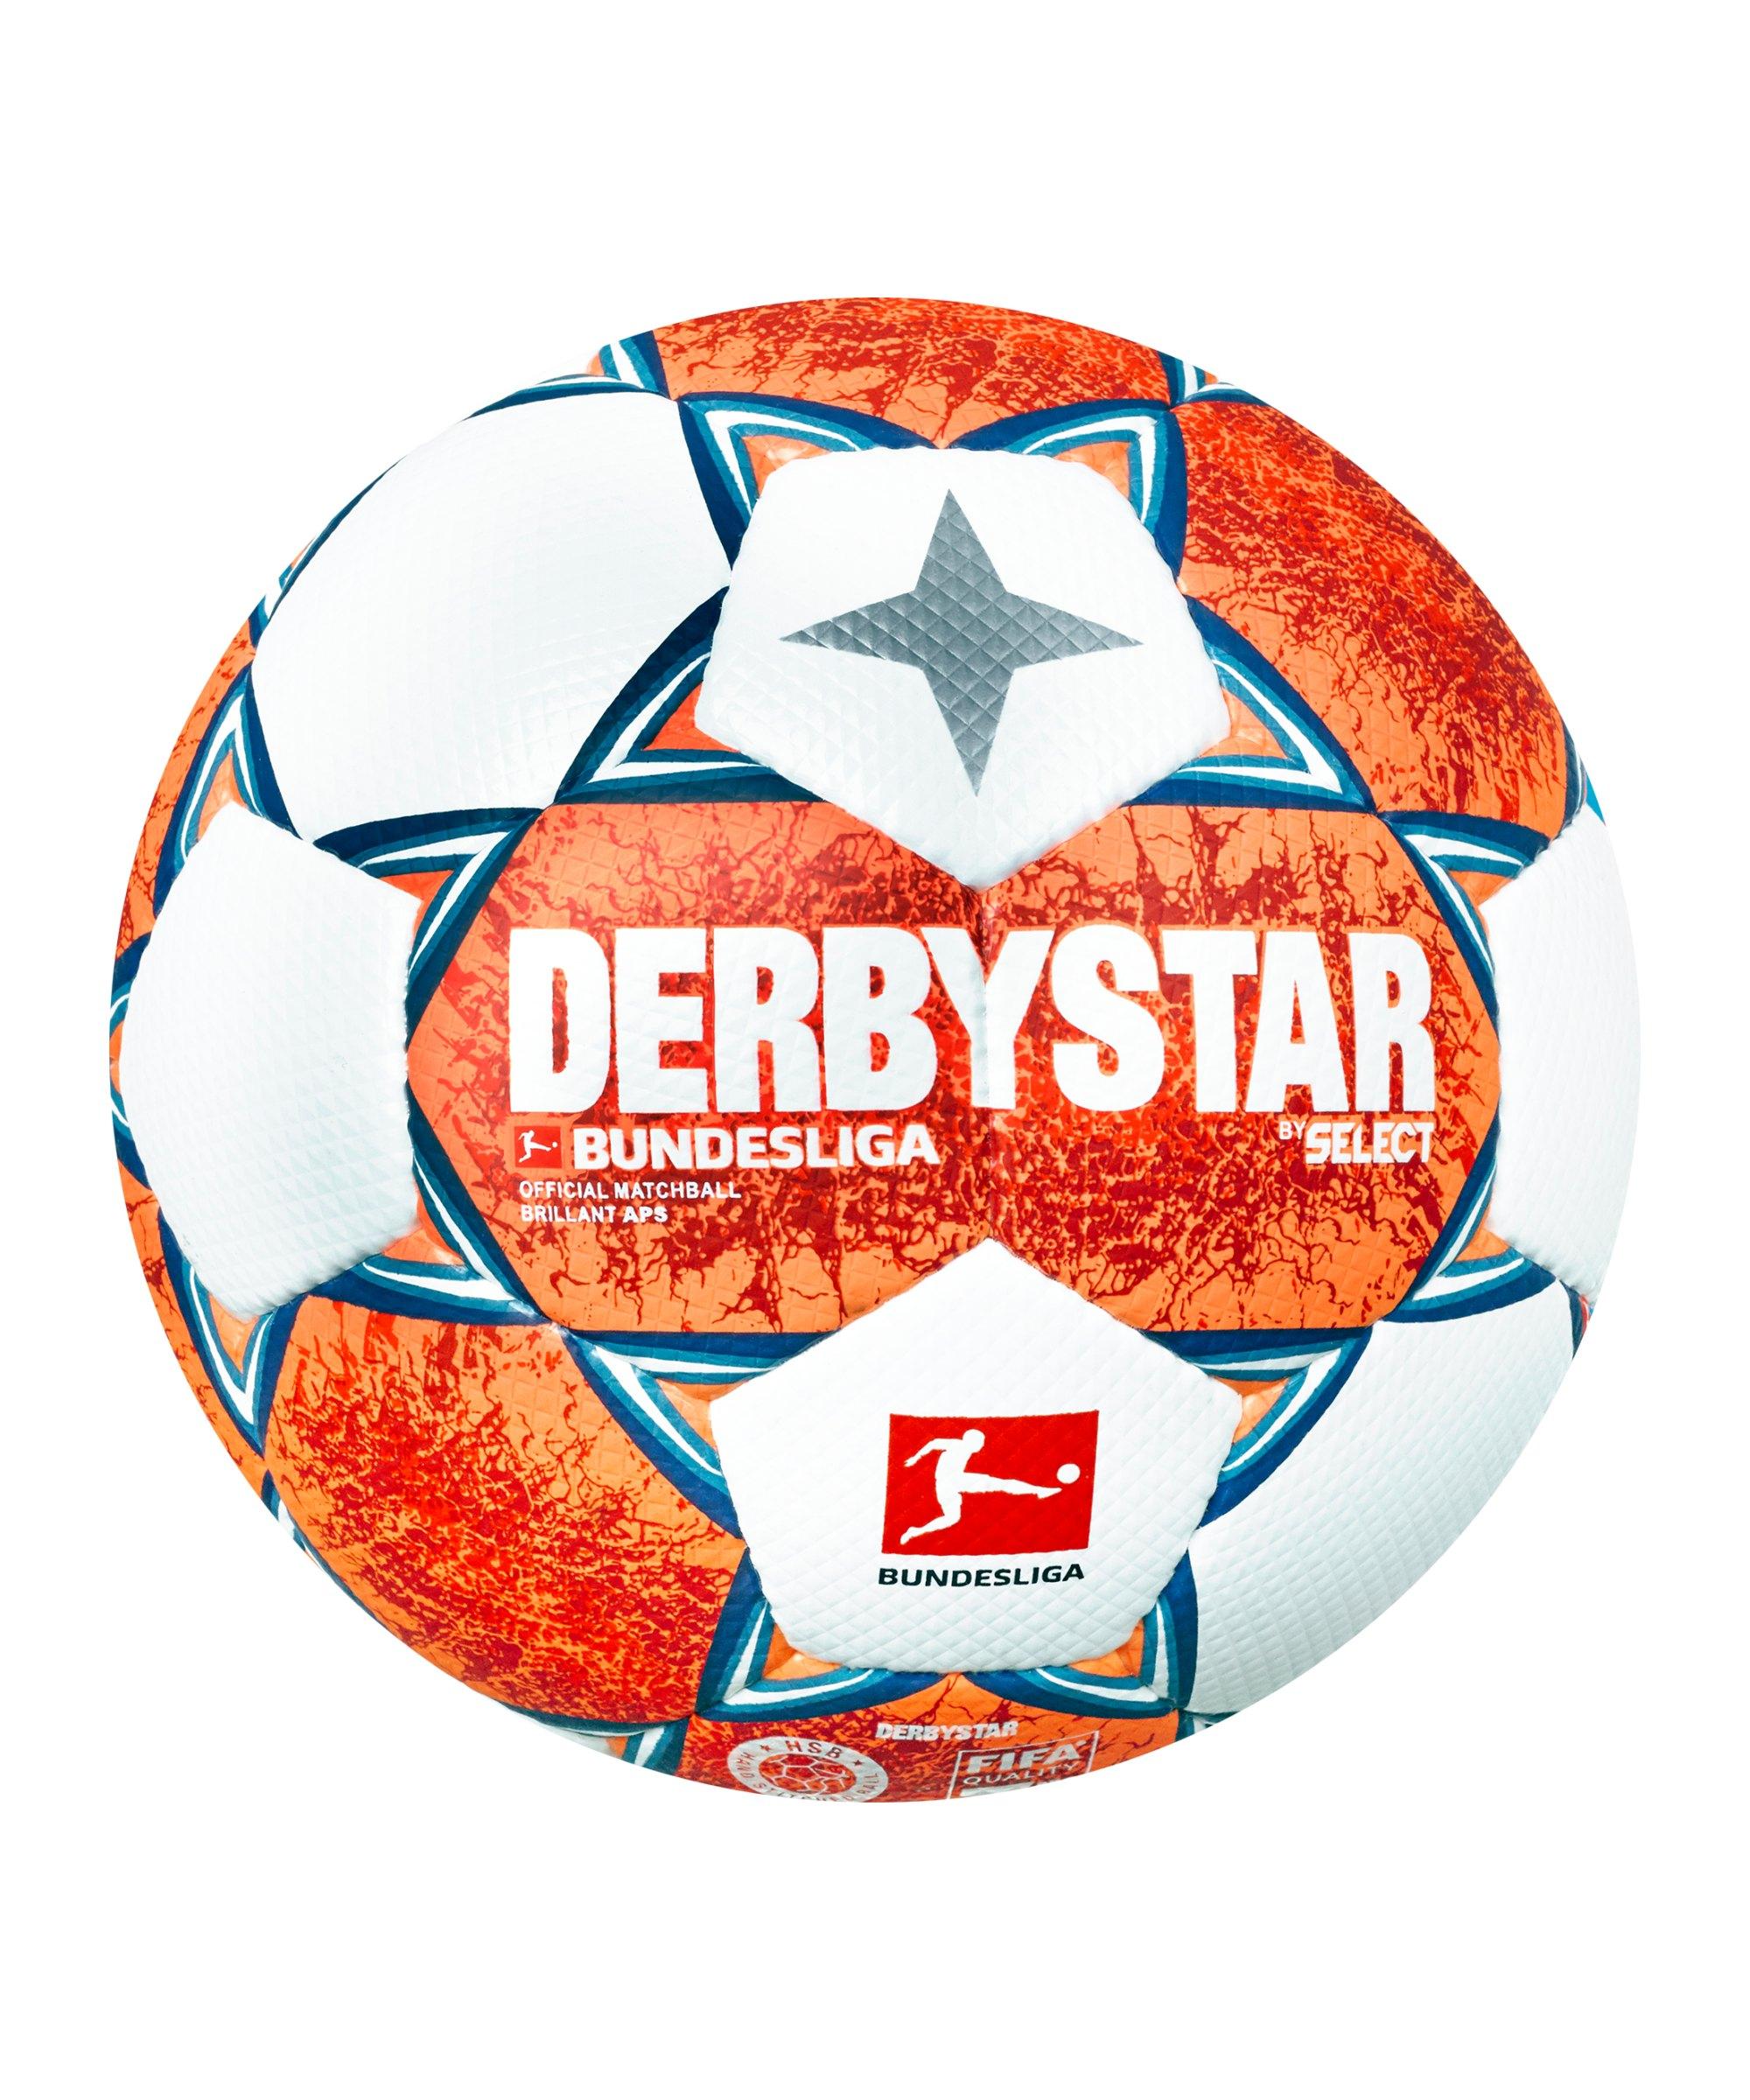 Derbystar Bundesliga Brillant APS v21 Spielball 2021/2022 Orange Blau Weiss F021 - orange